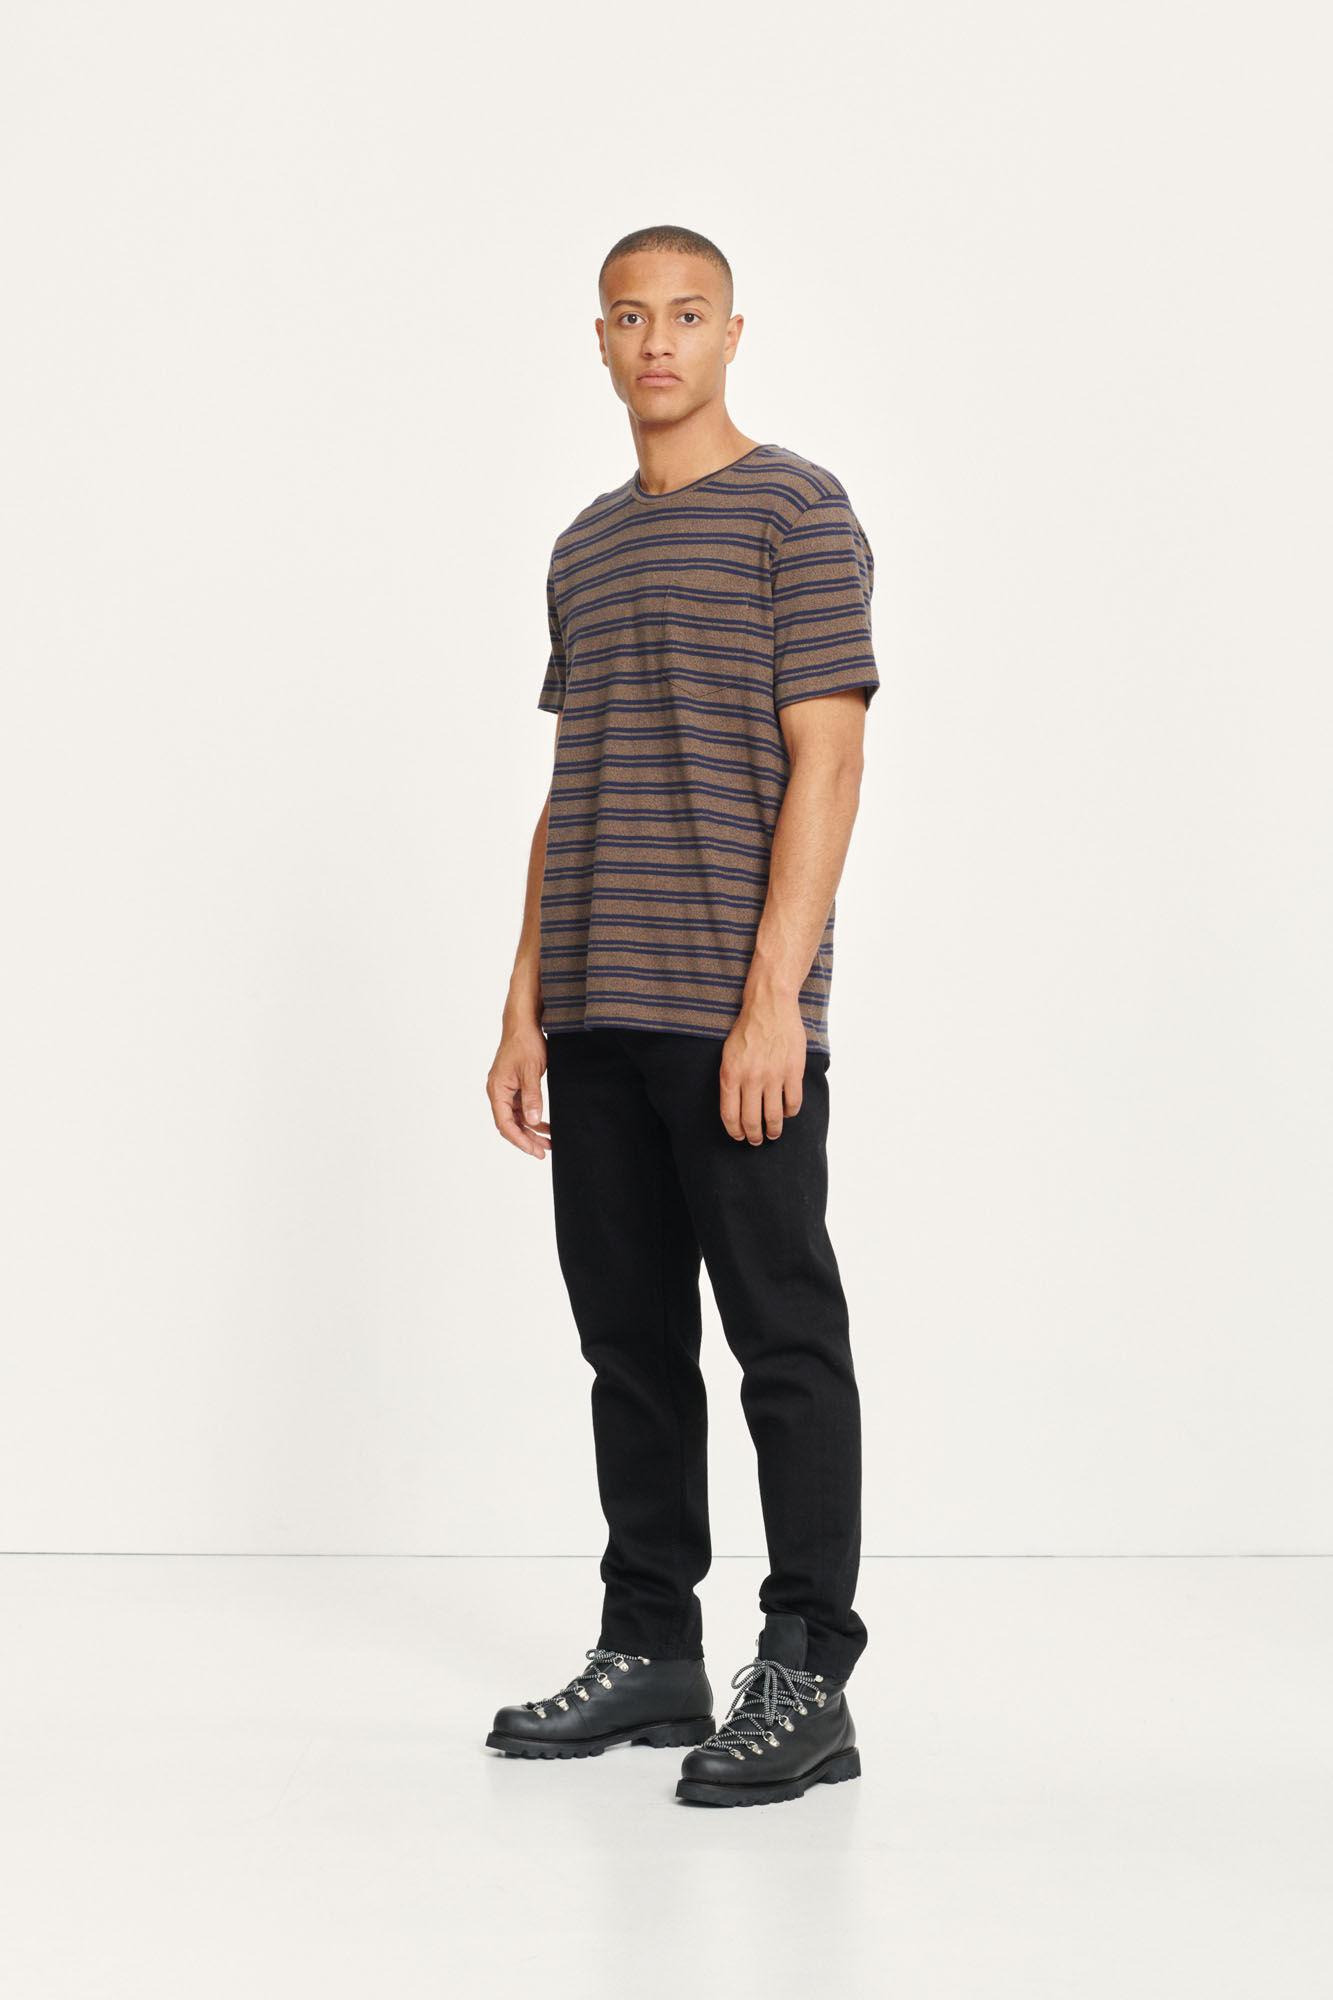 Carpo T-Shirt St Kangaroo Brown Blue Stripe 7888-3